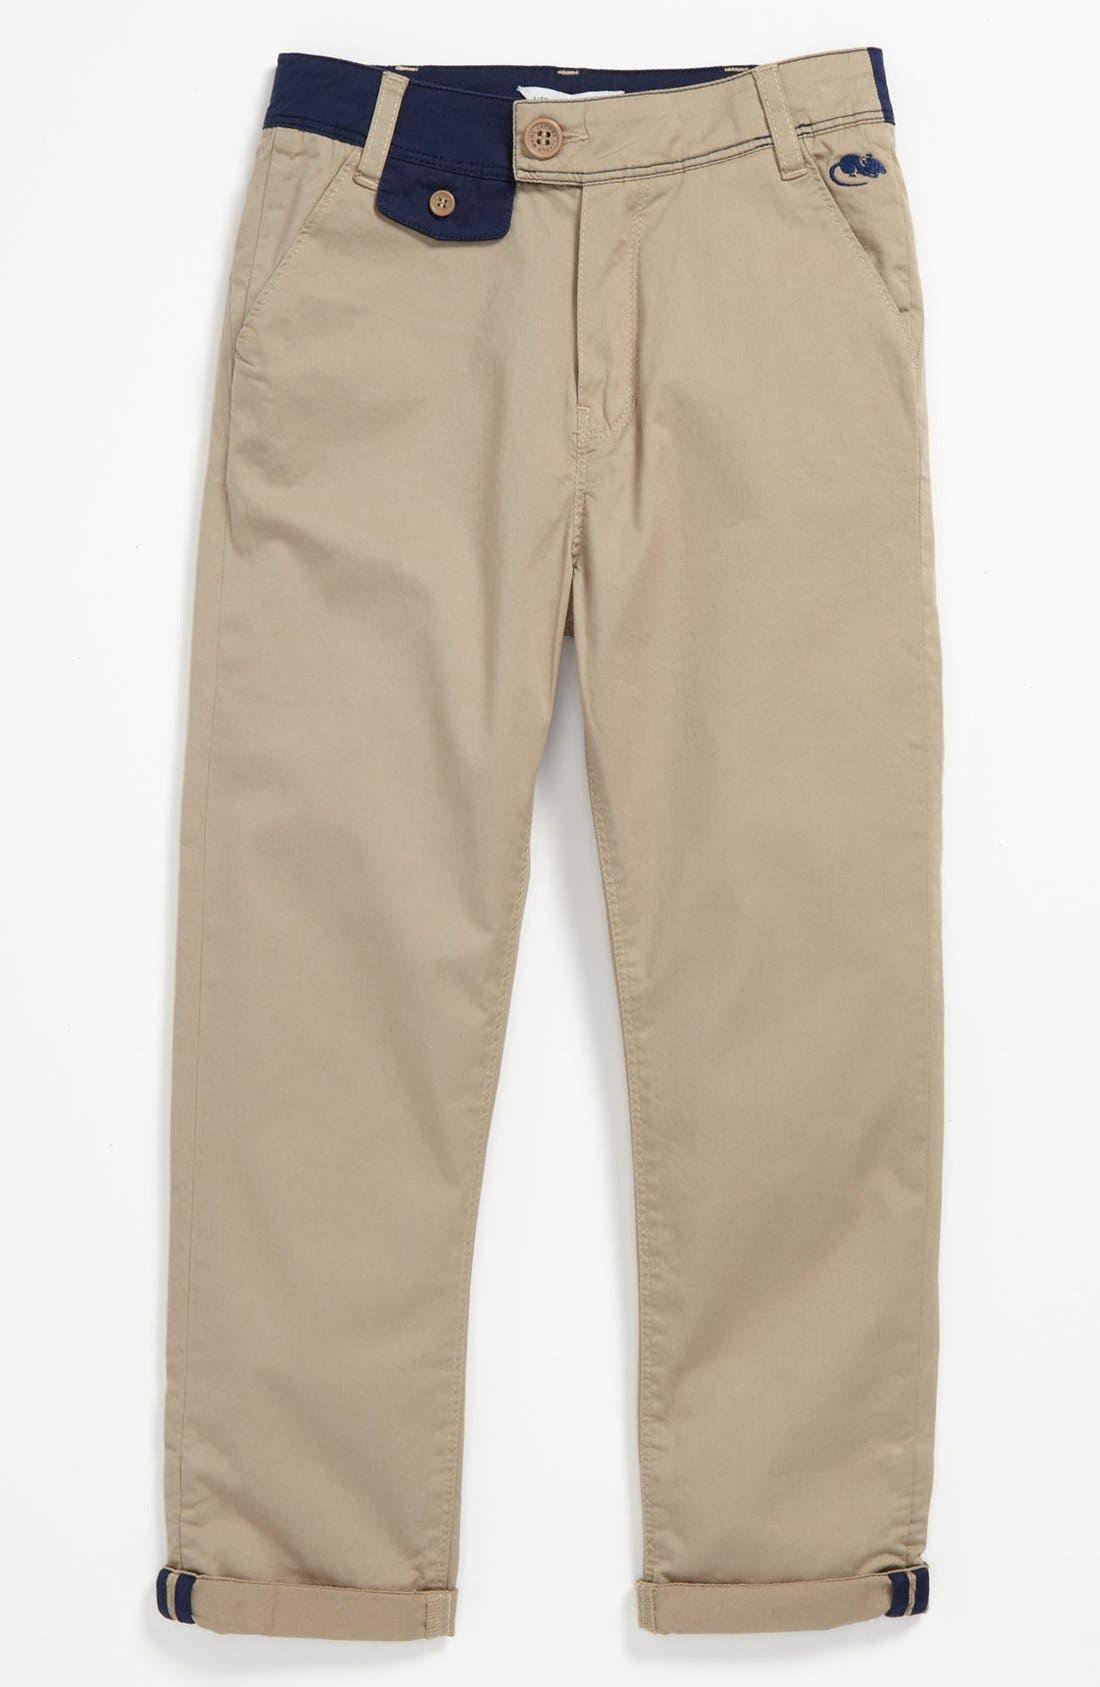 Alternate Image 1 Selected - LITTLE MARC JACOBS Stretch Gabardine Pants (Big Boys)